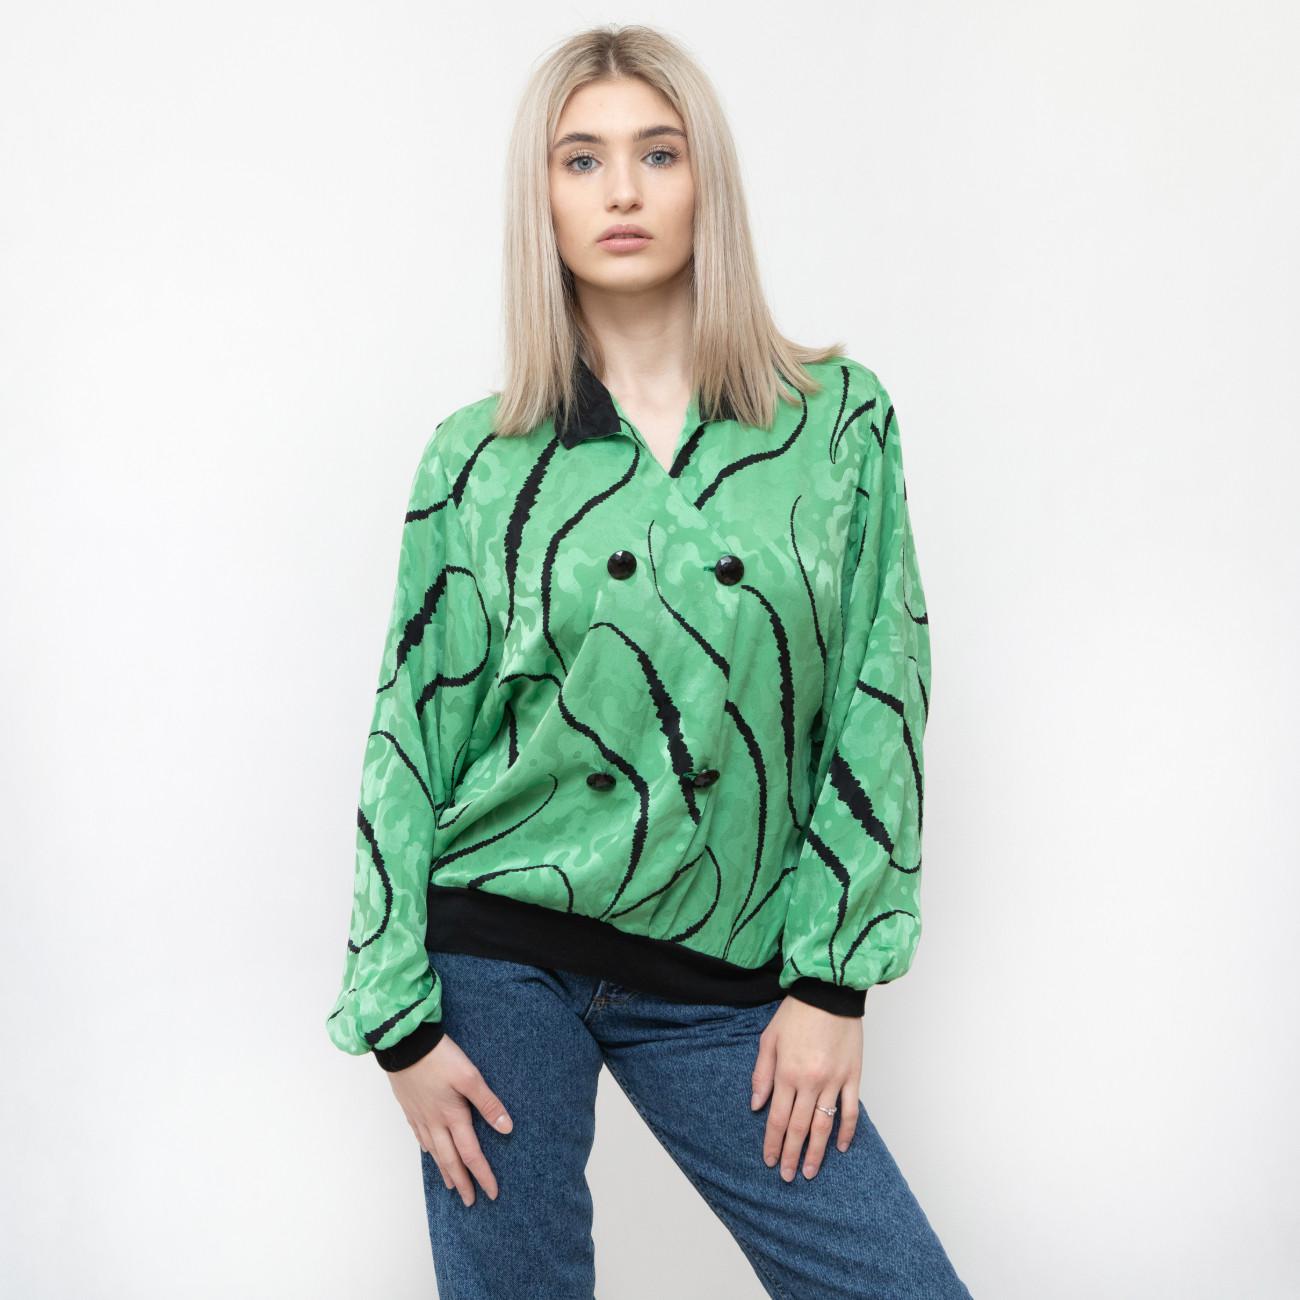 Jedwabna koszula Valentino - KEX Vintage Store | JestemSlow.pl